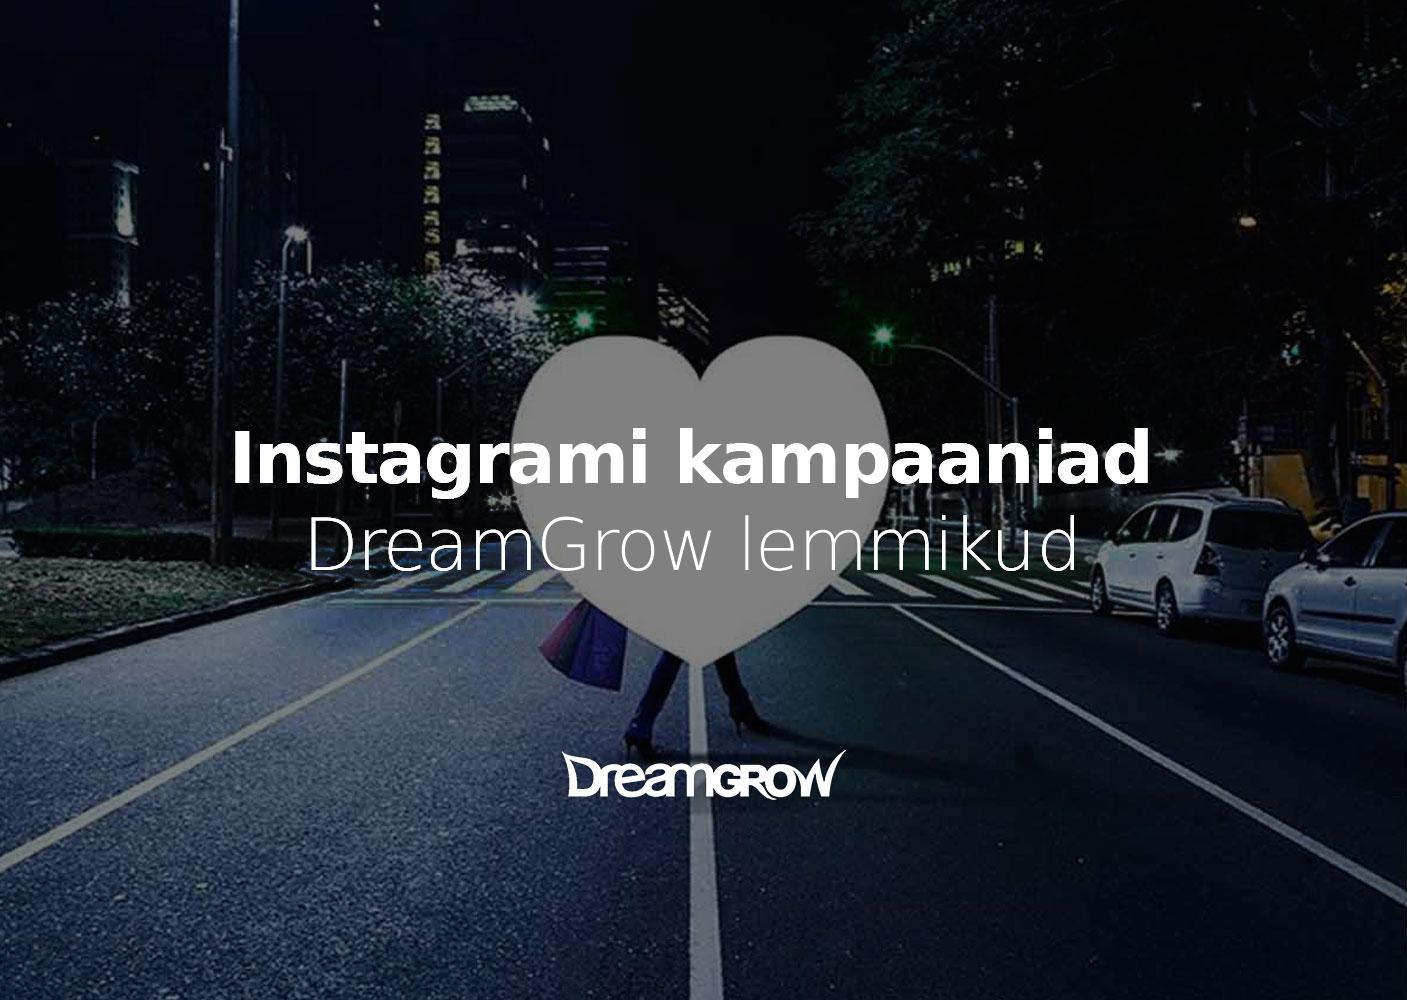 instagram-kampaaniad-dreamgrow